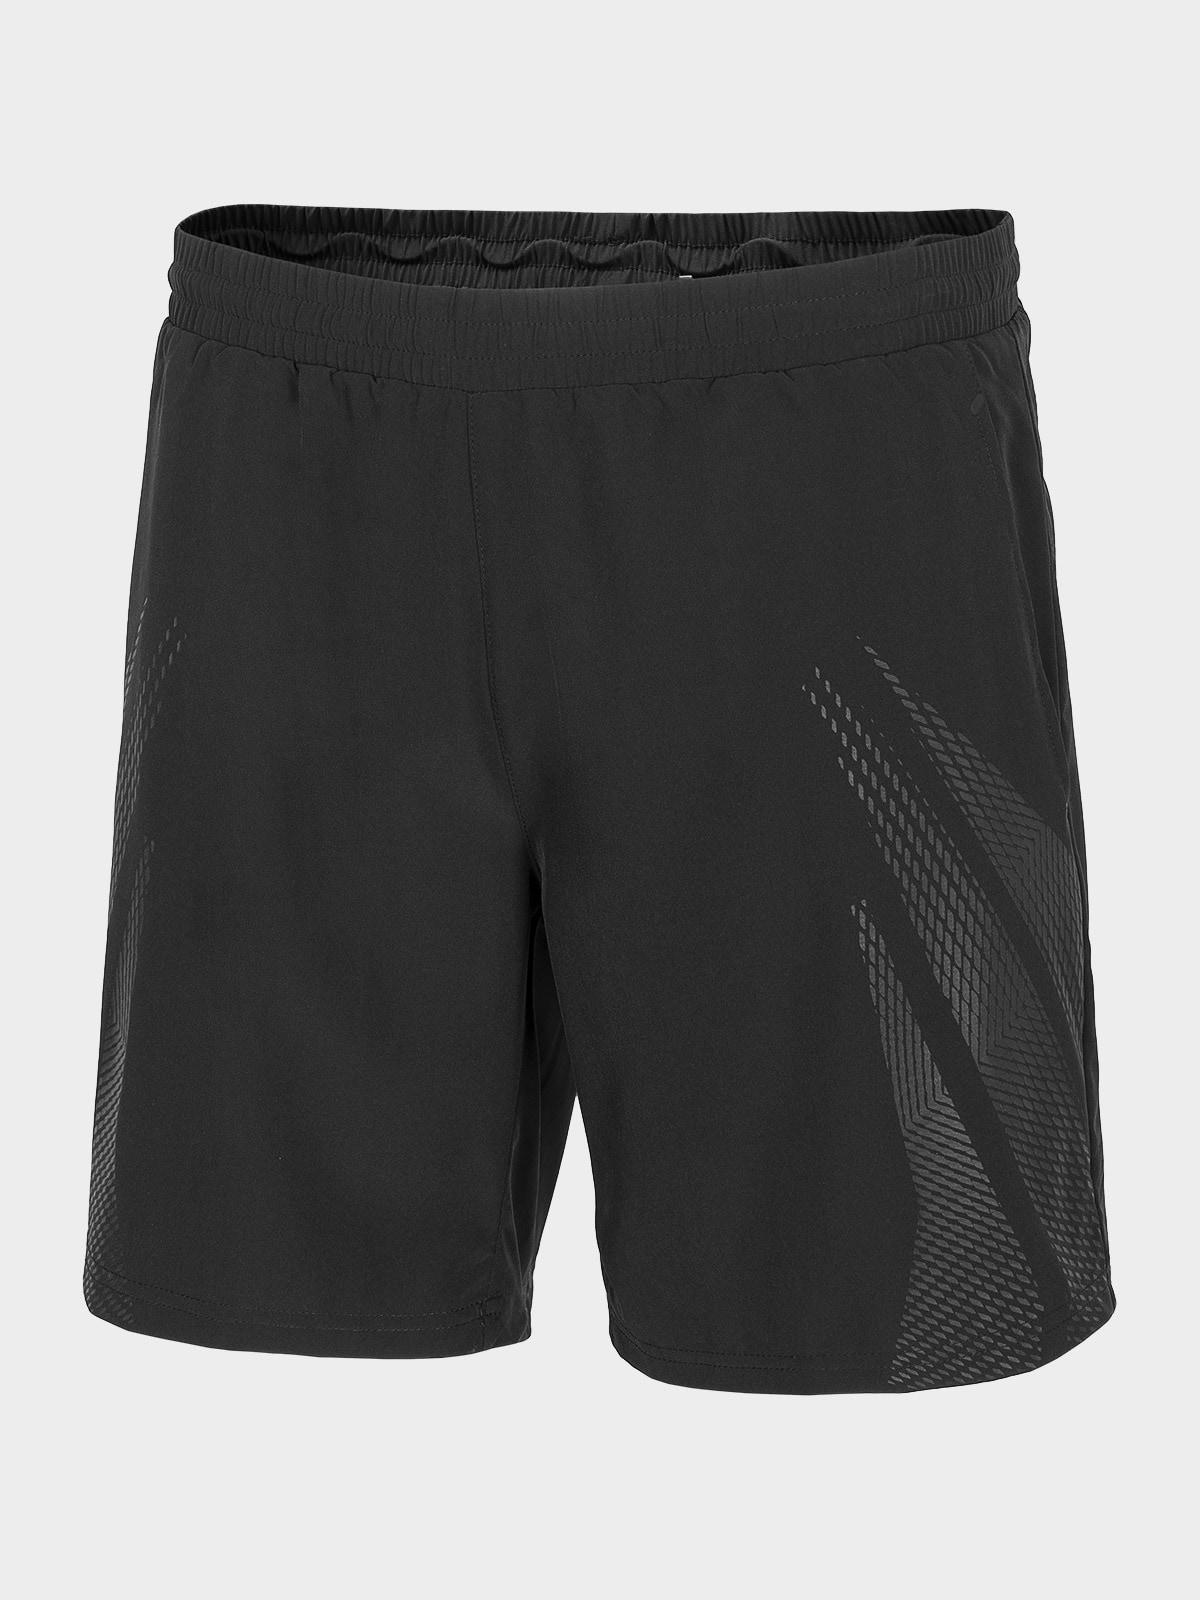 Imagine Pantaloni Scurti Functionali Pentru Barbati